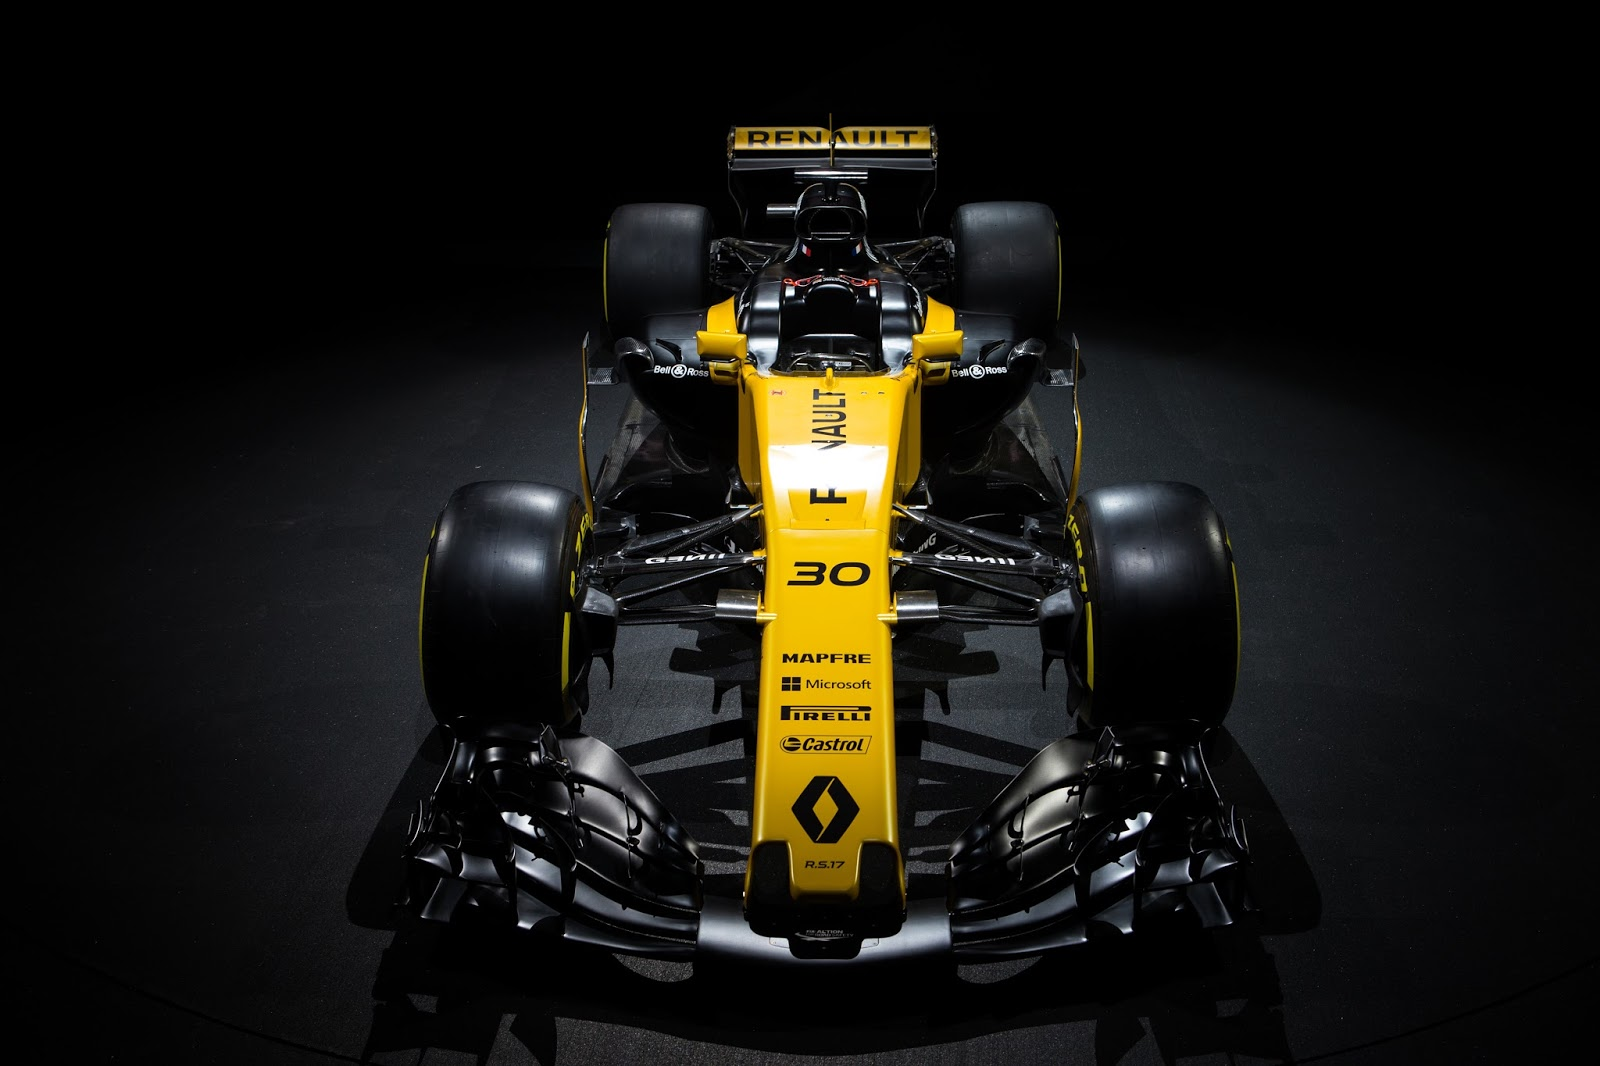 210217 RL 008 1 Η Renault Sport παρουσίασε το καινούργιο της μονοθέσιο, την R.S.17 F1, Formula 1, Renault, Renault Sport Formula 1 Team, videos